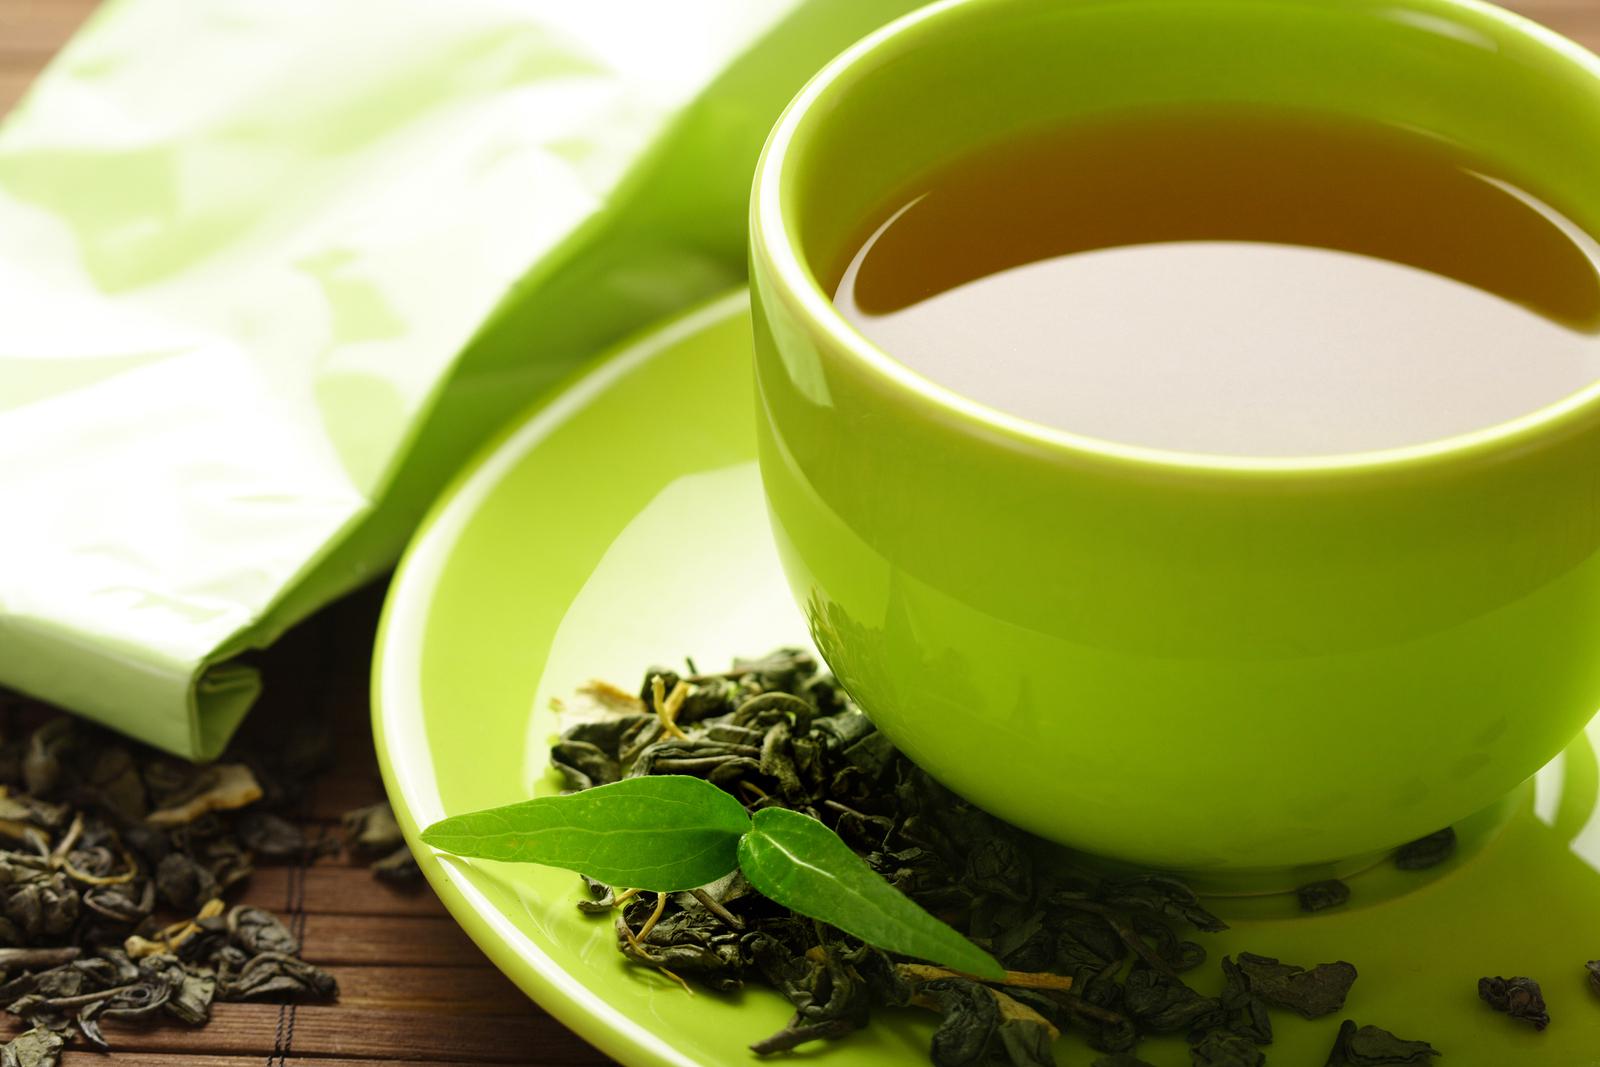 bigstock-healthy-green-tea-cup-with-tea-15743465.jpg